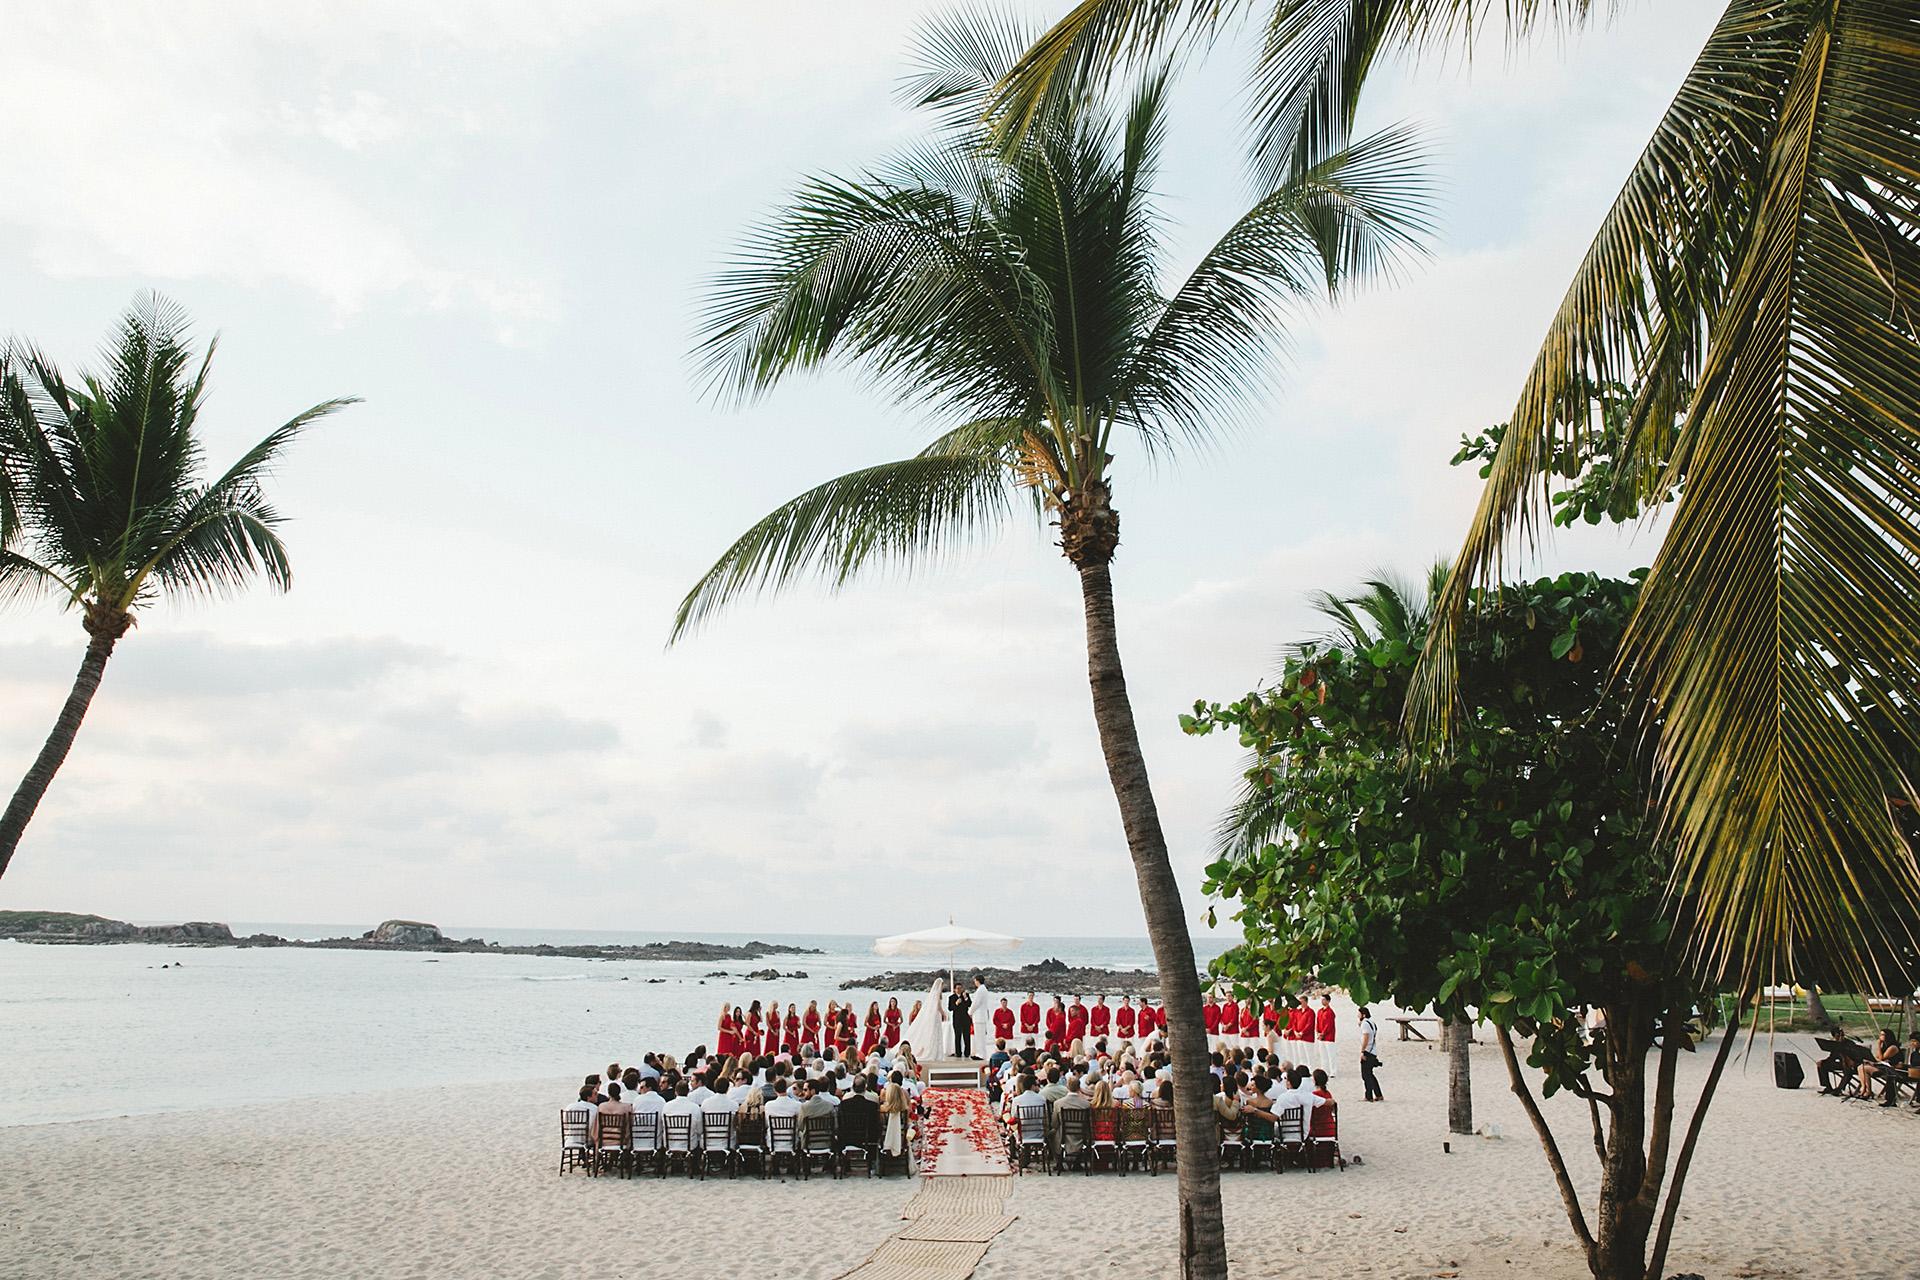 st regis hotel wedding punta mita